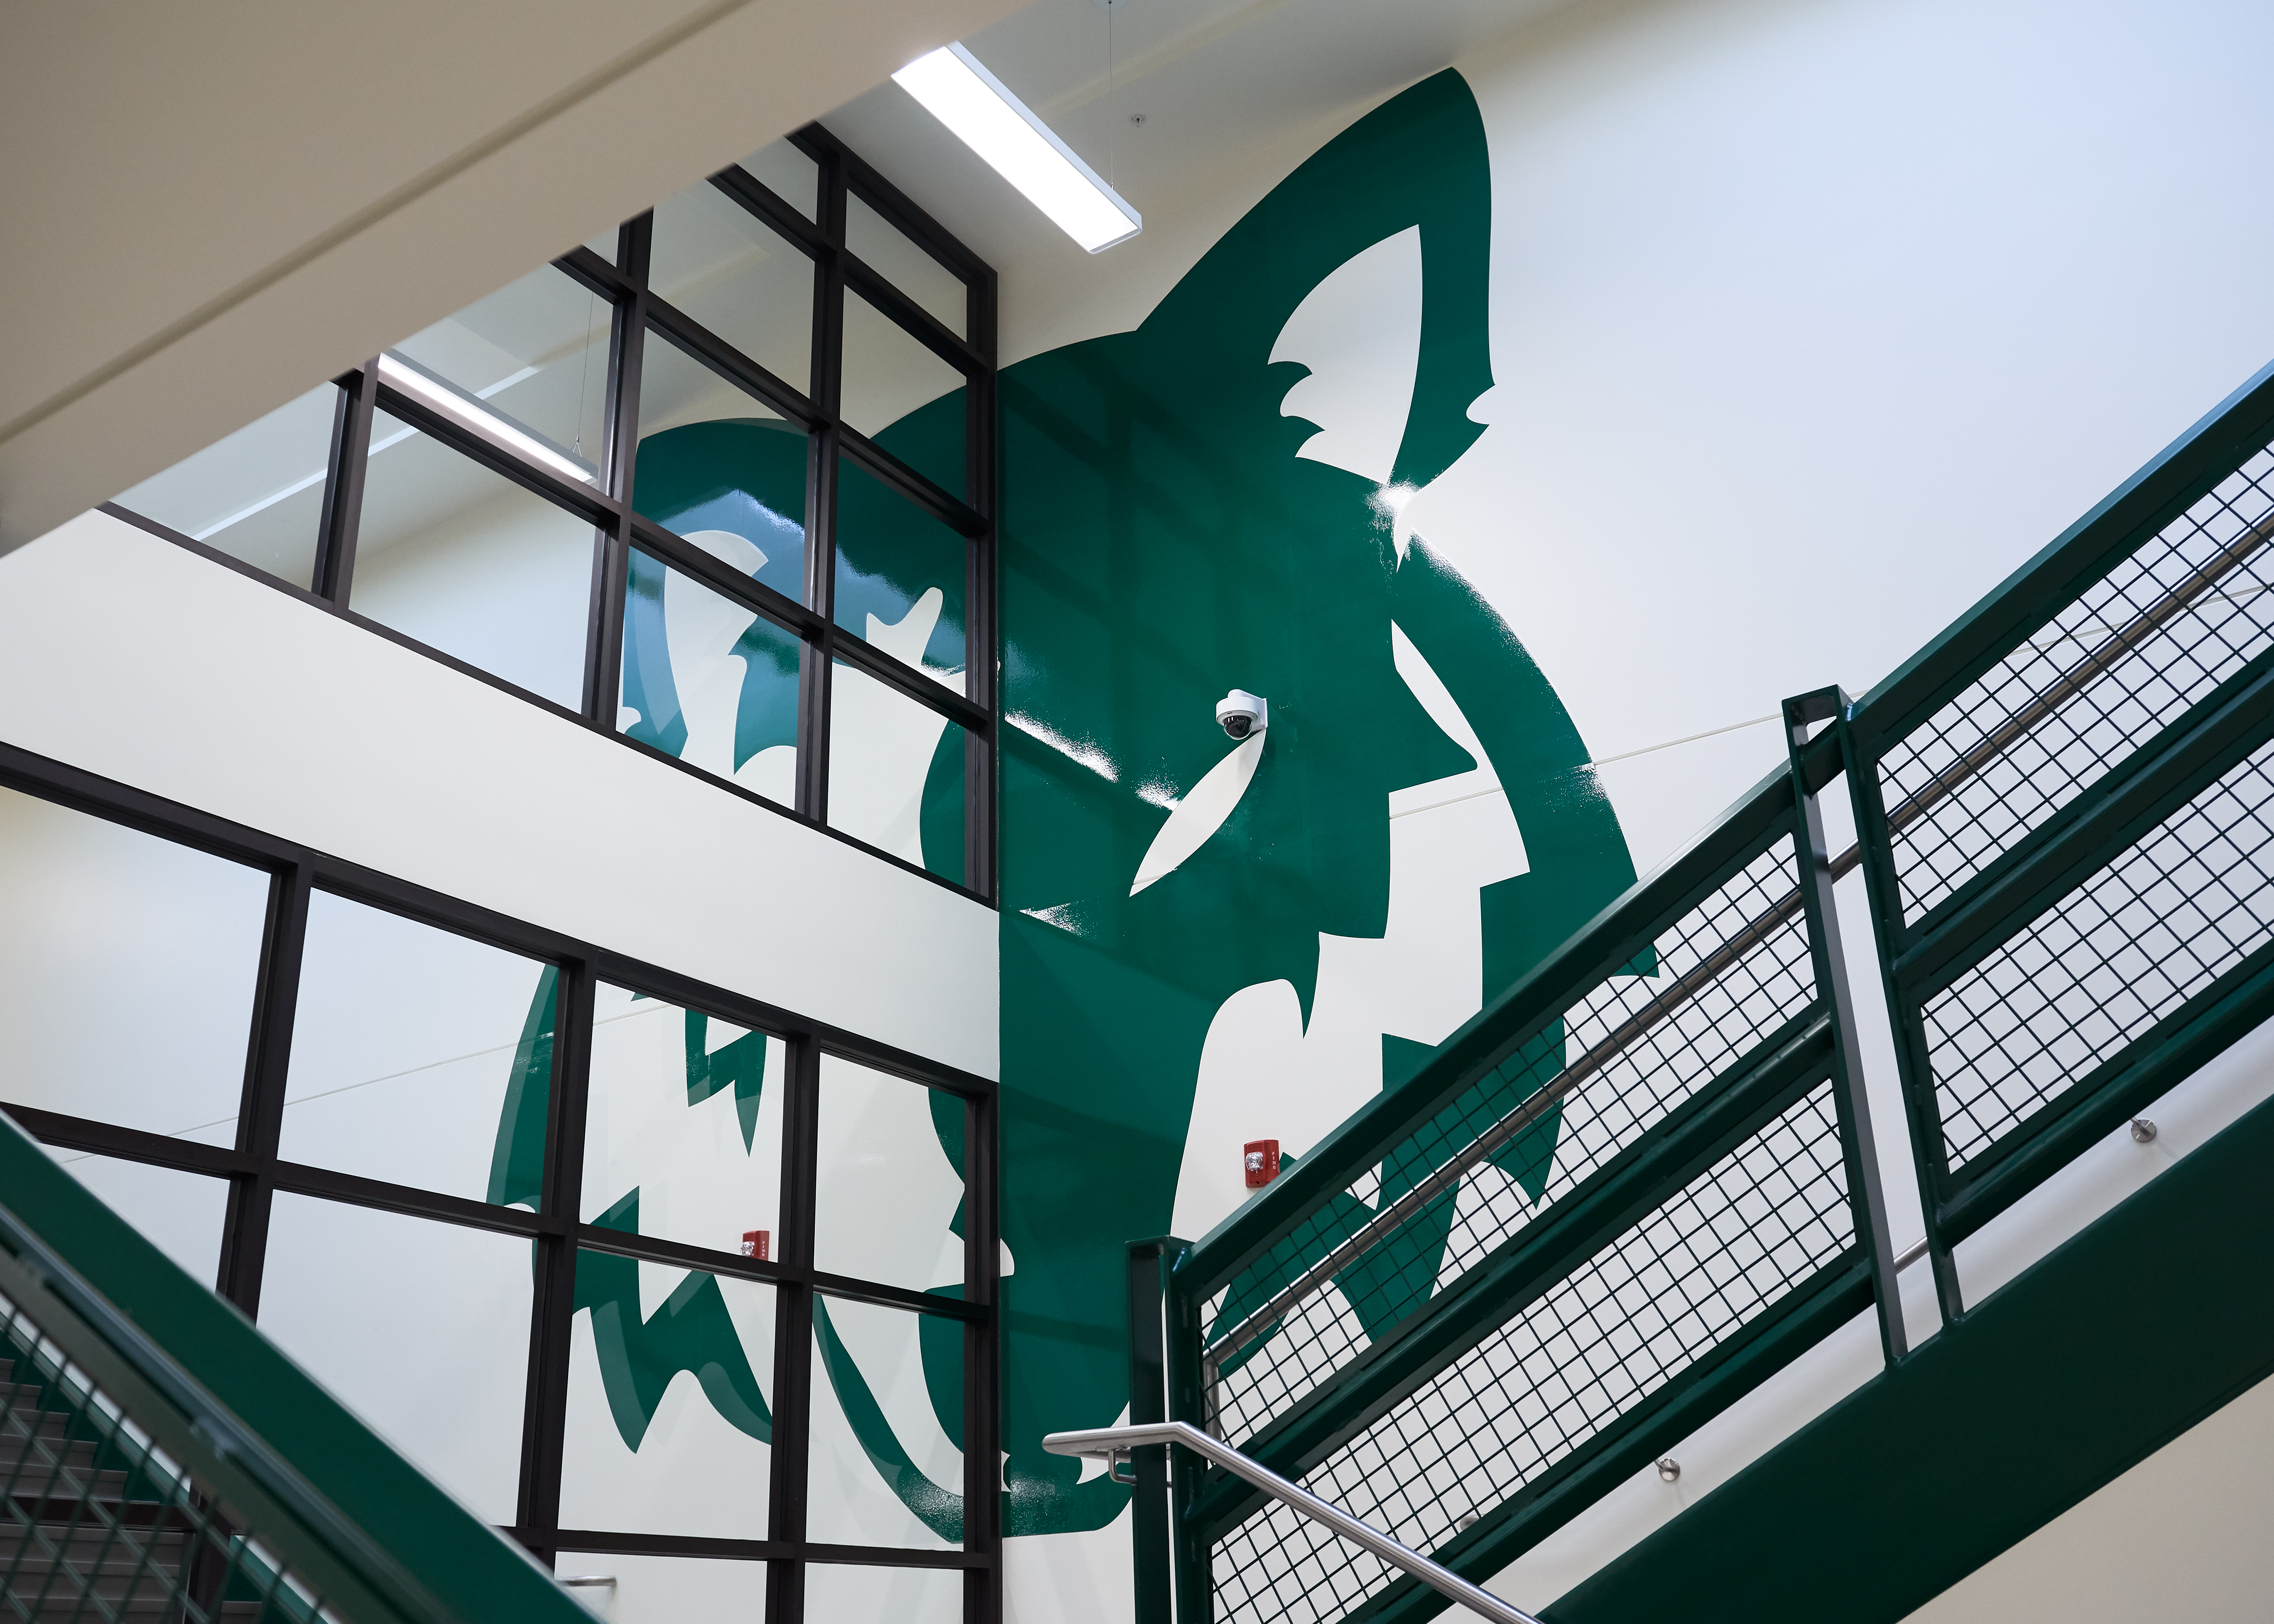 Green Canon High School Mascot Mural - North Logan, HS